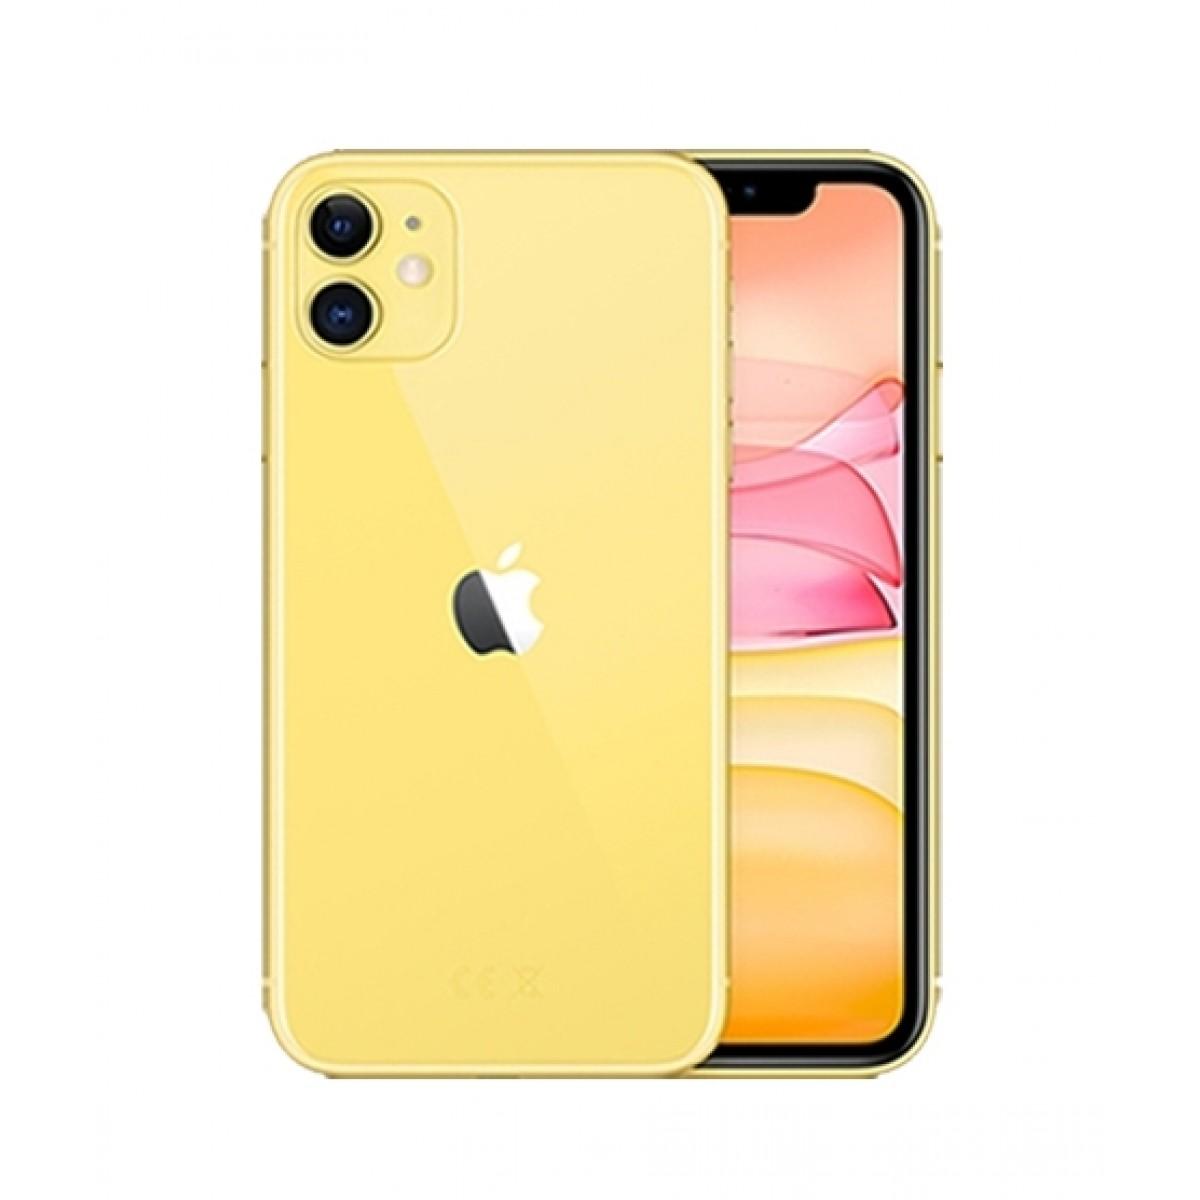 Apple iPhone 11 256GB Dual Sim Yellow - Non PTA Compliant